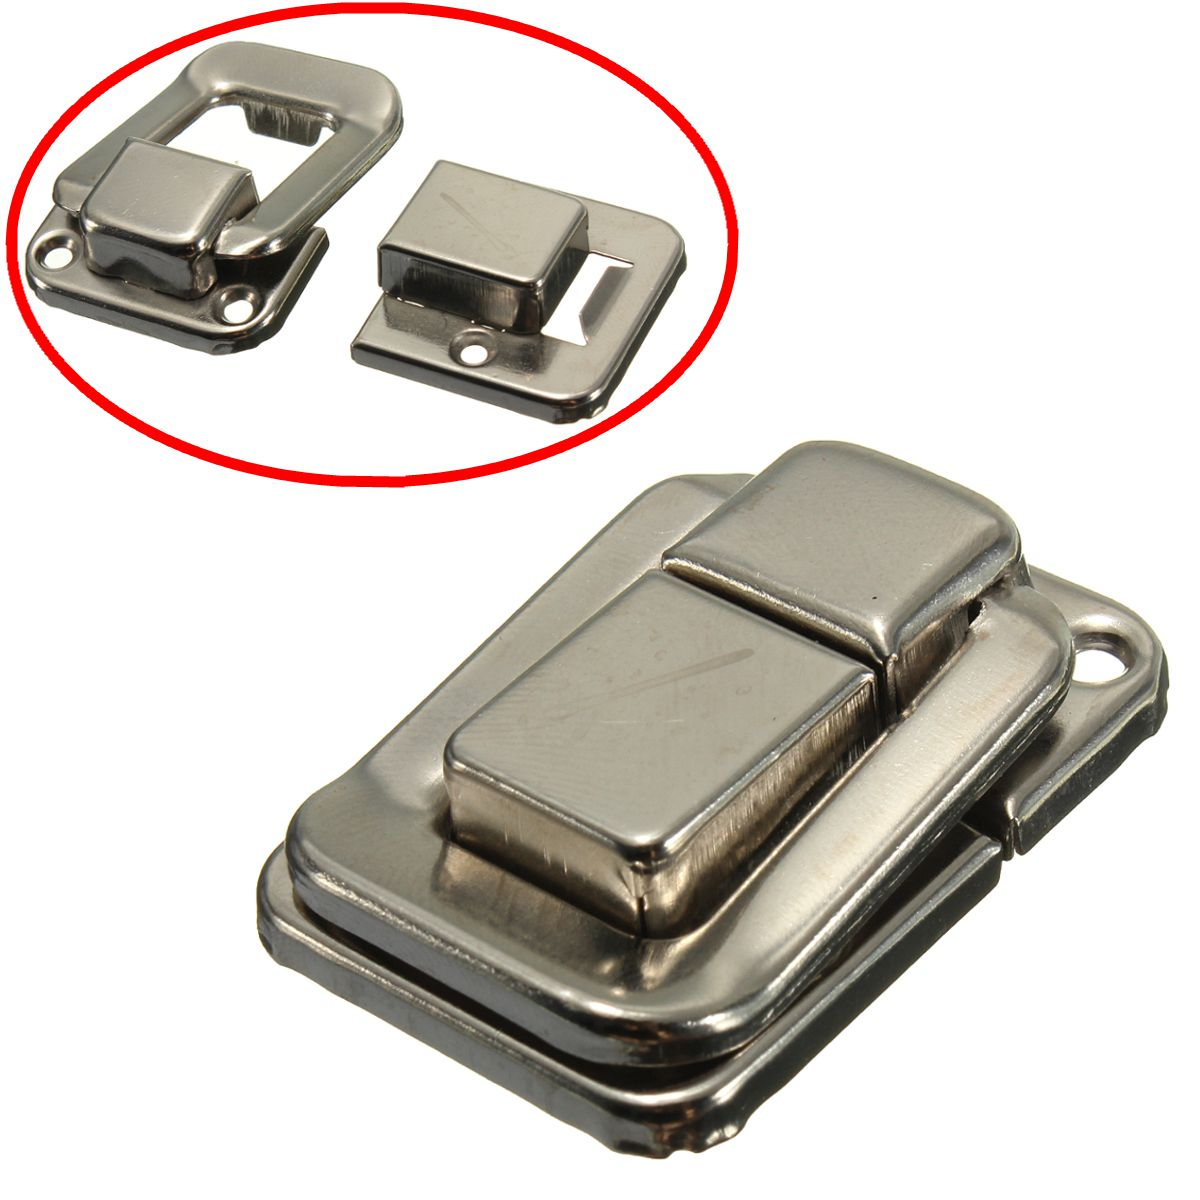 4x enganche de cierre de palanca de cierre de 37mm x 25mm para cajas de maleta